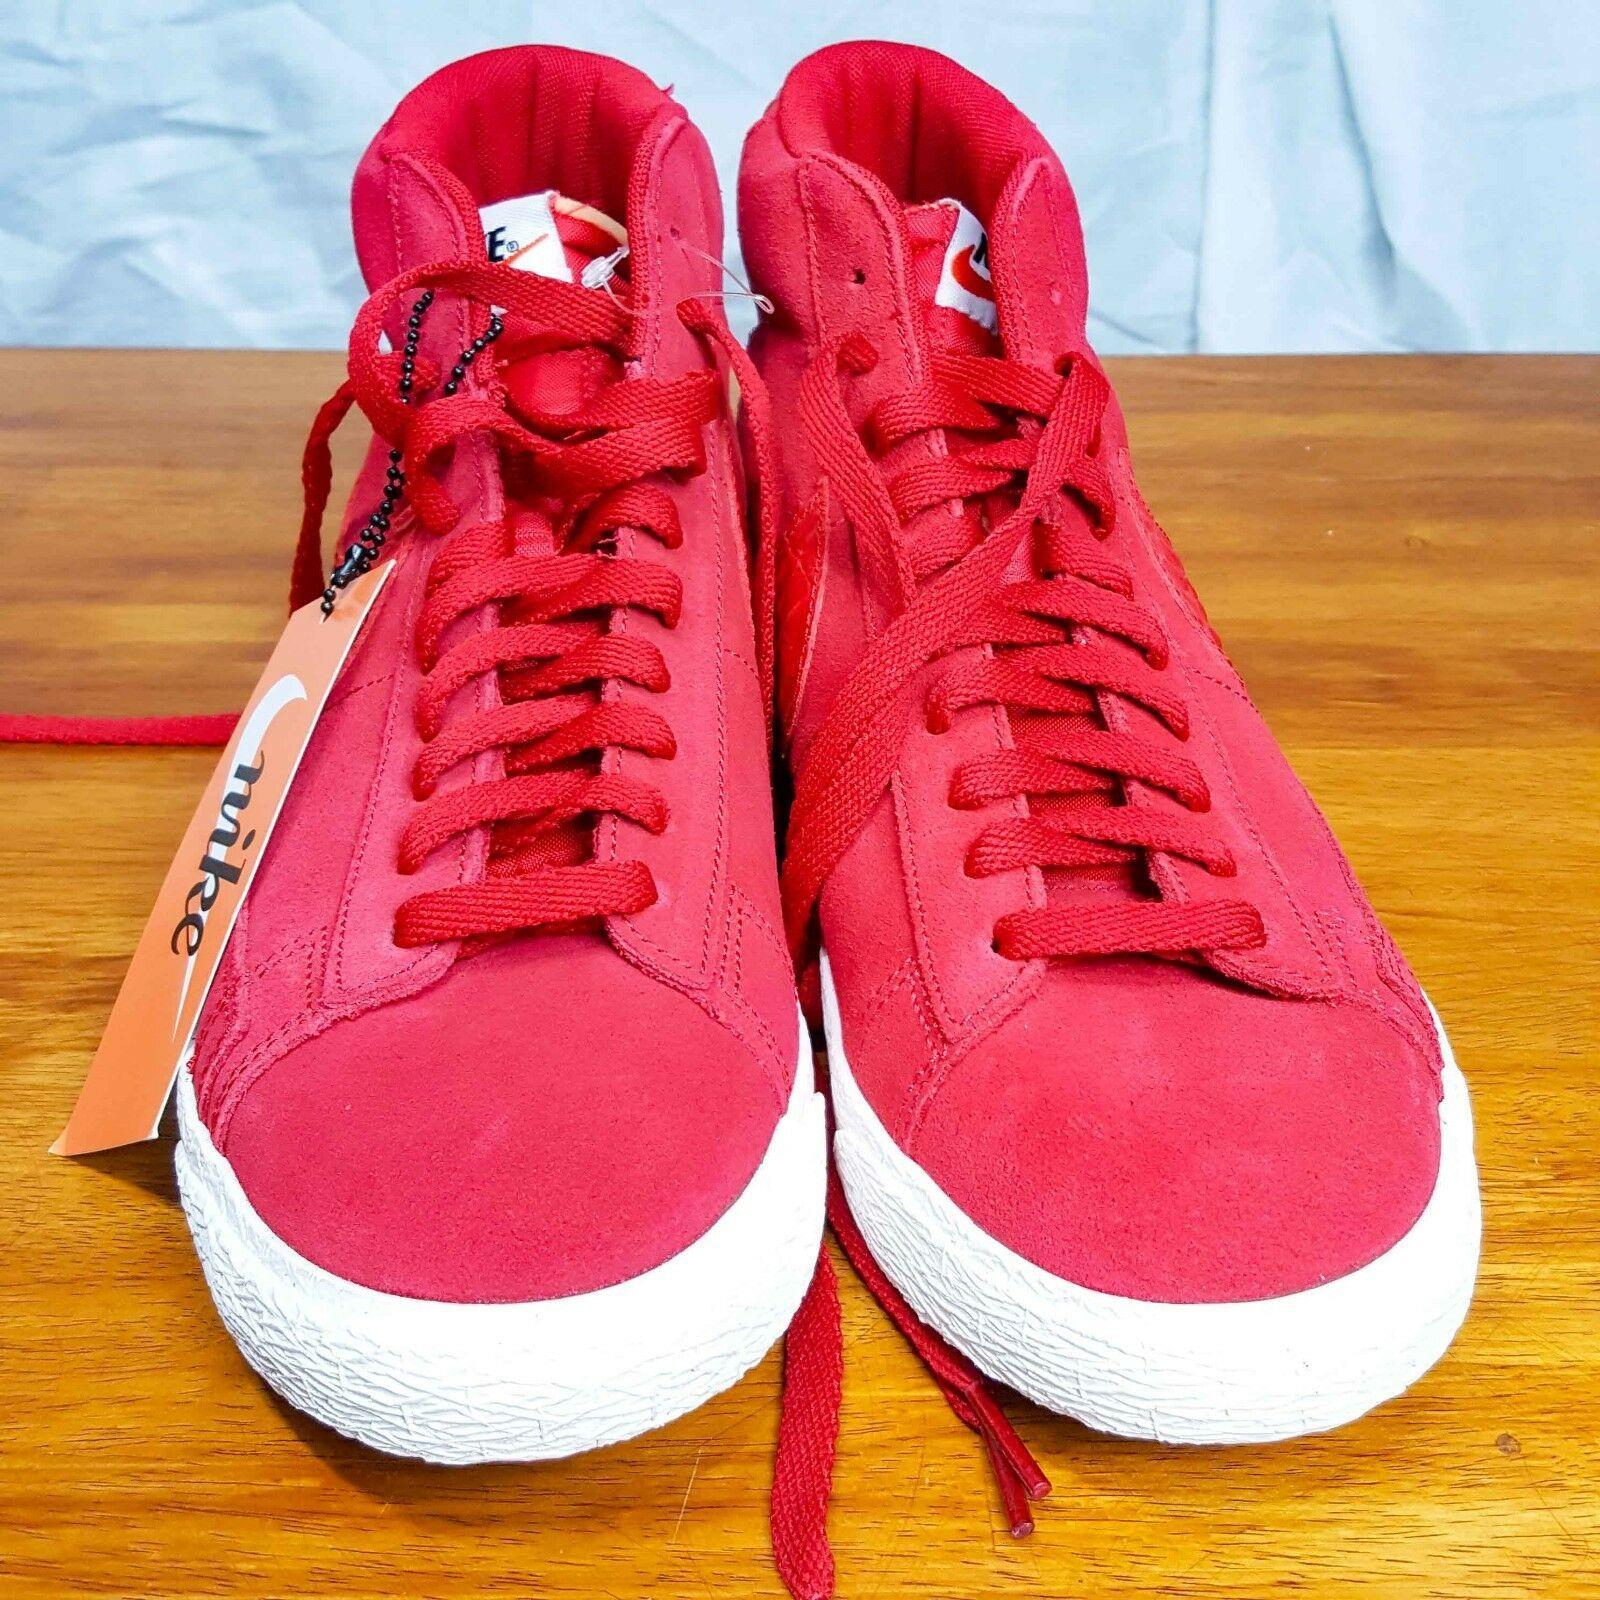 a41637f51d459 Nike Blazer Mid Premium Vintage Rosso Palestra Vela GOMMA 638261-601 Us  10.5 Eu